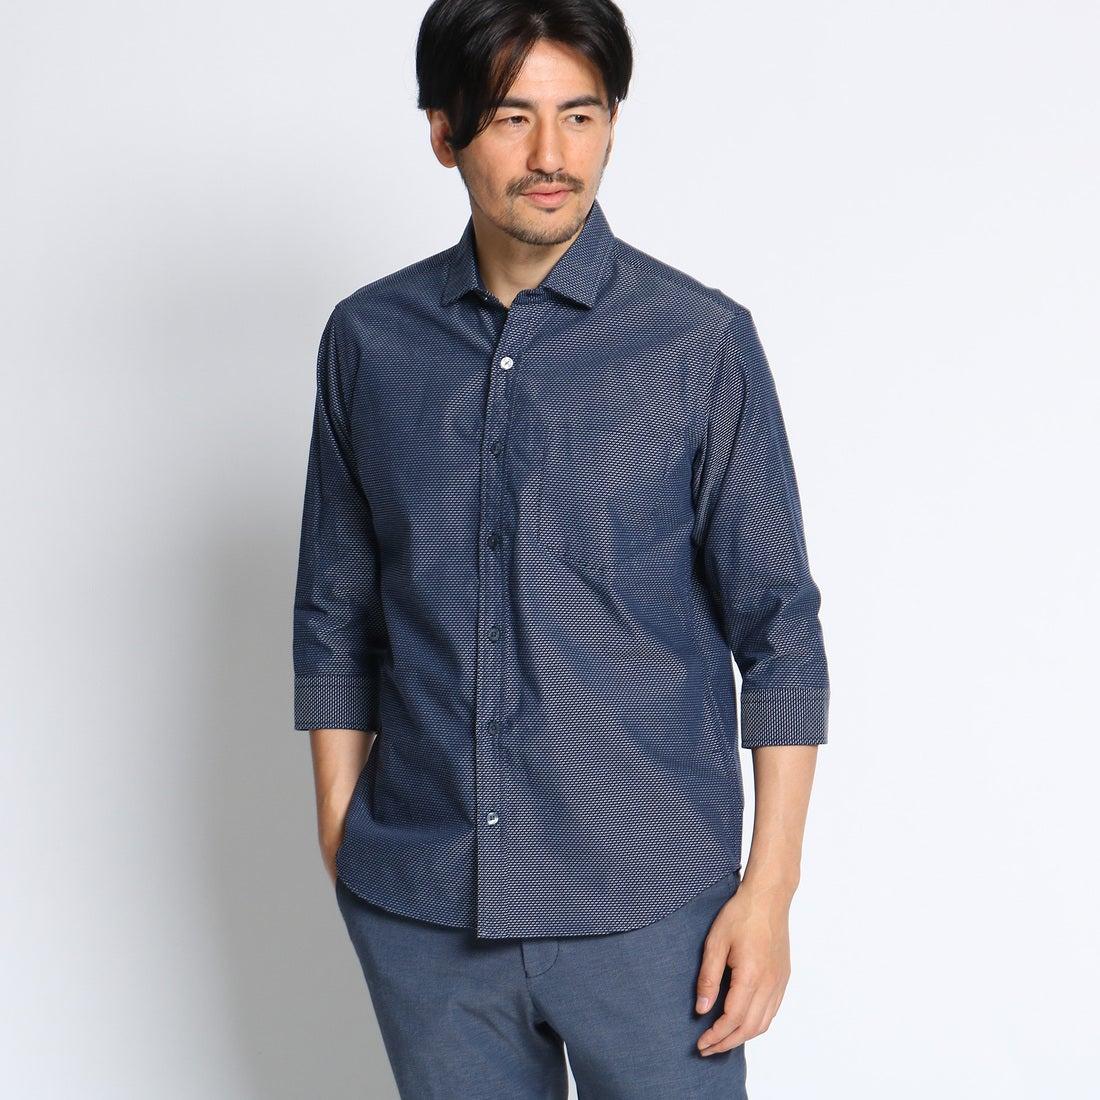 【SALE 50%OFF】タケオ キクチ TAKEO KIKUCHI ステッチボーダー7分袖シャツ [ メンズ シャツ 7分袖 ] (ブルー)